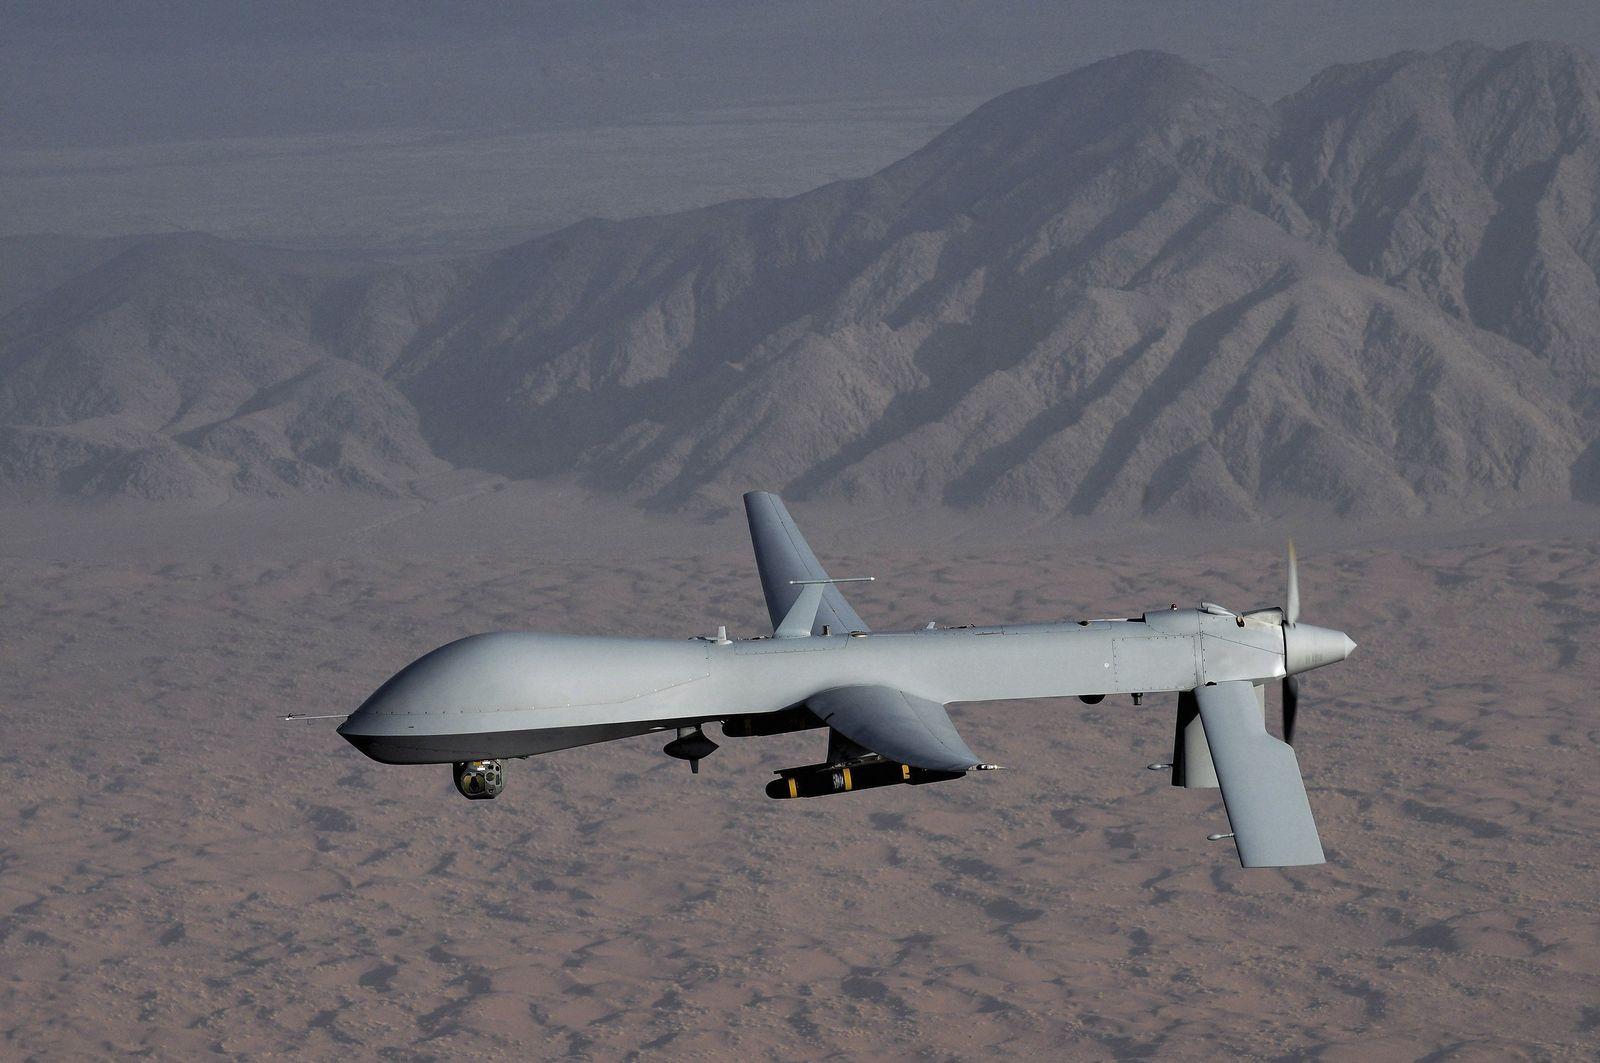 USA-DRONES/